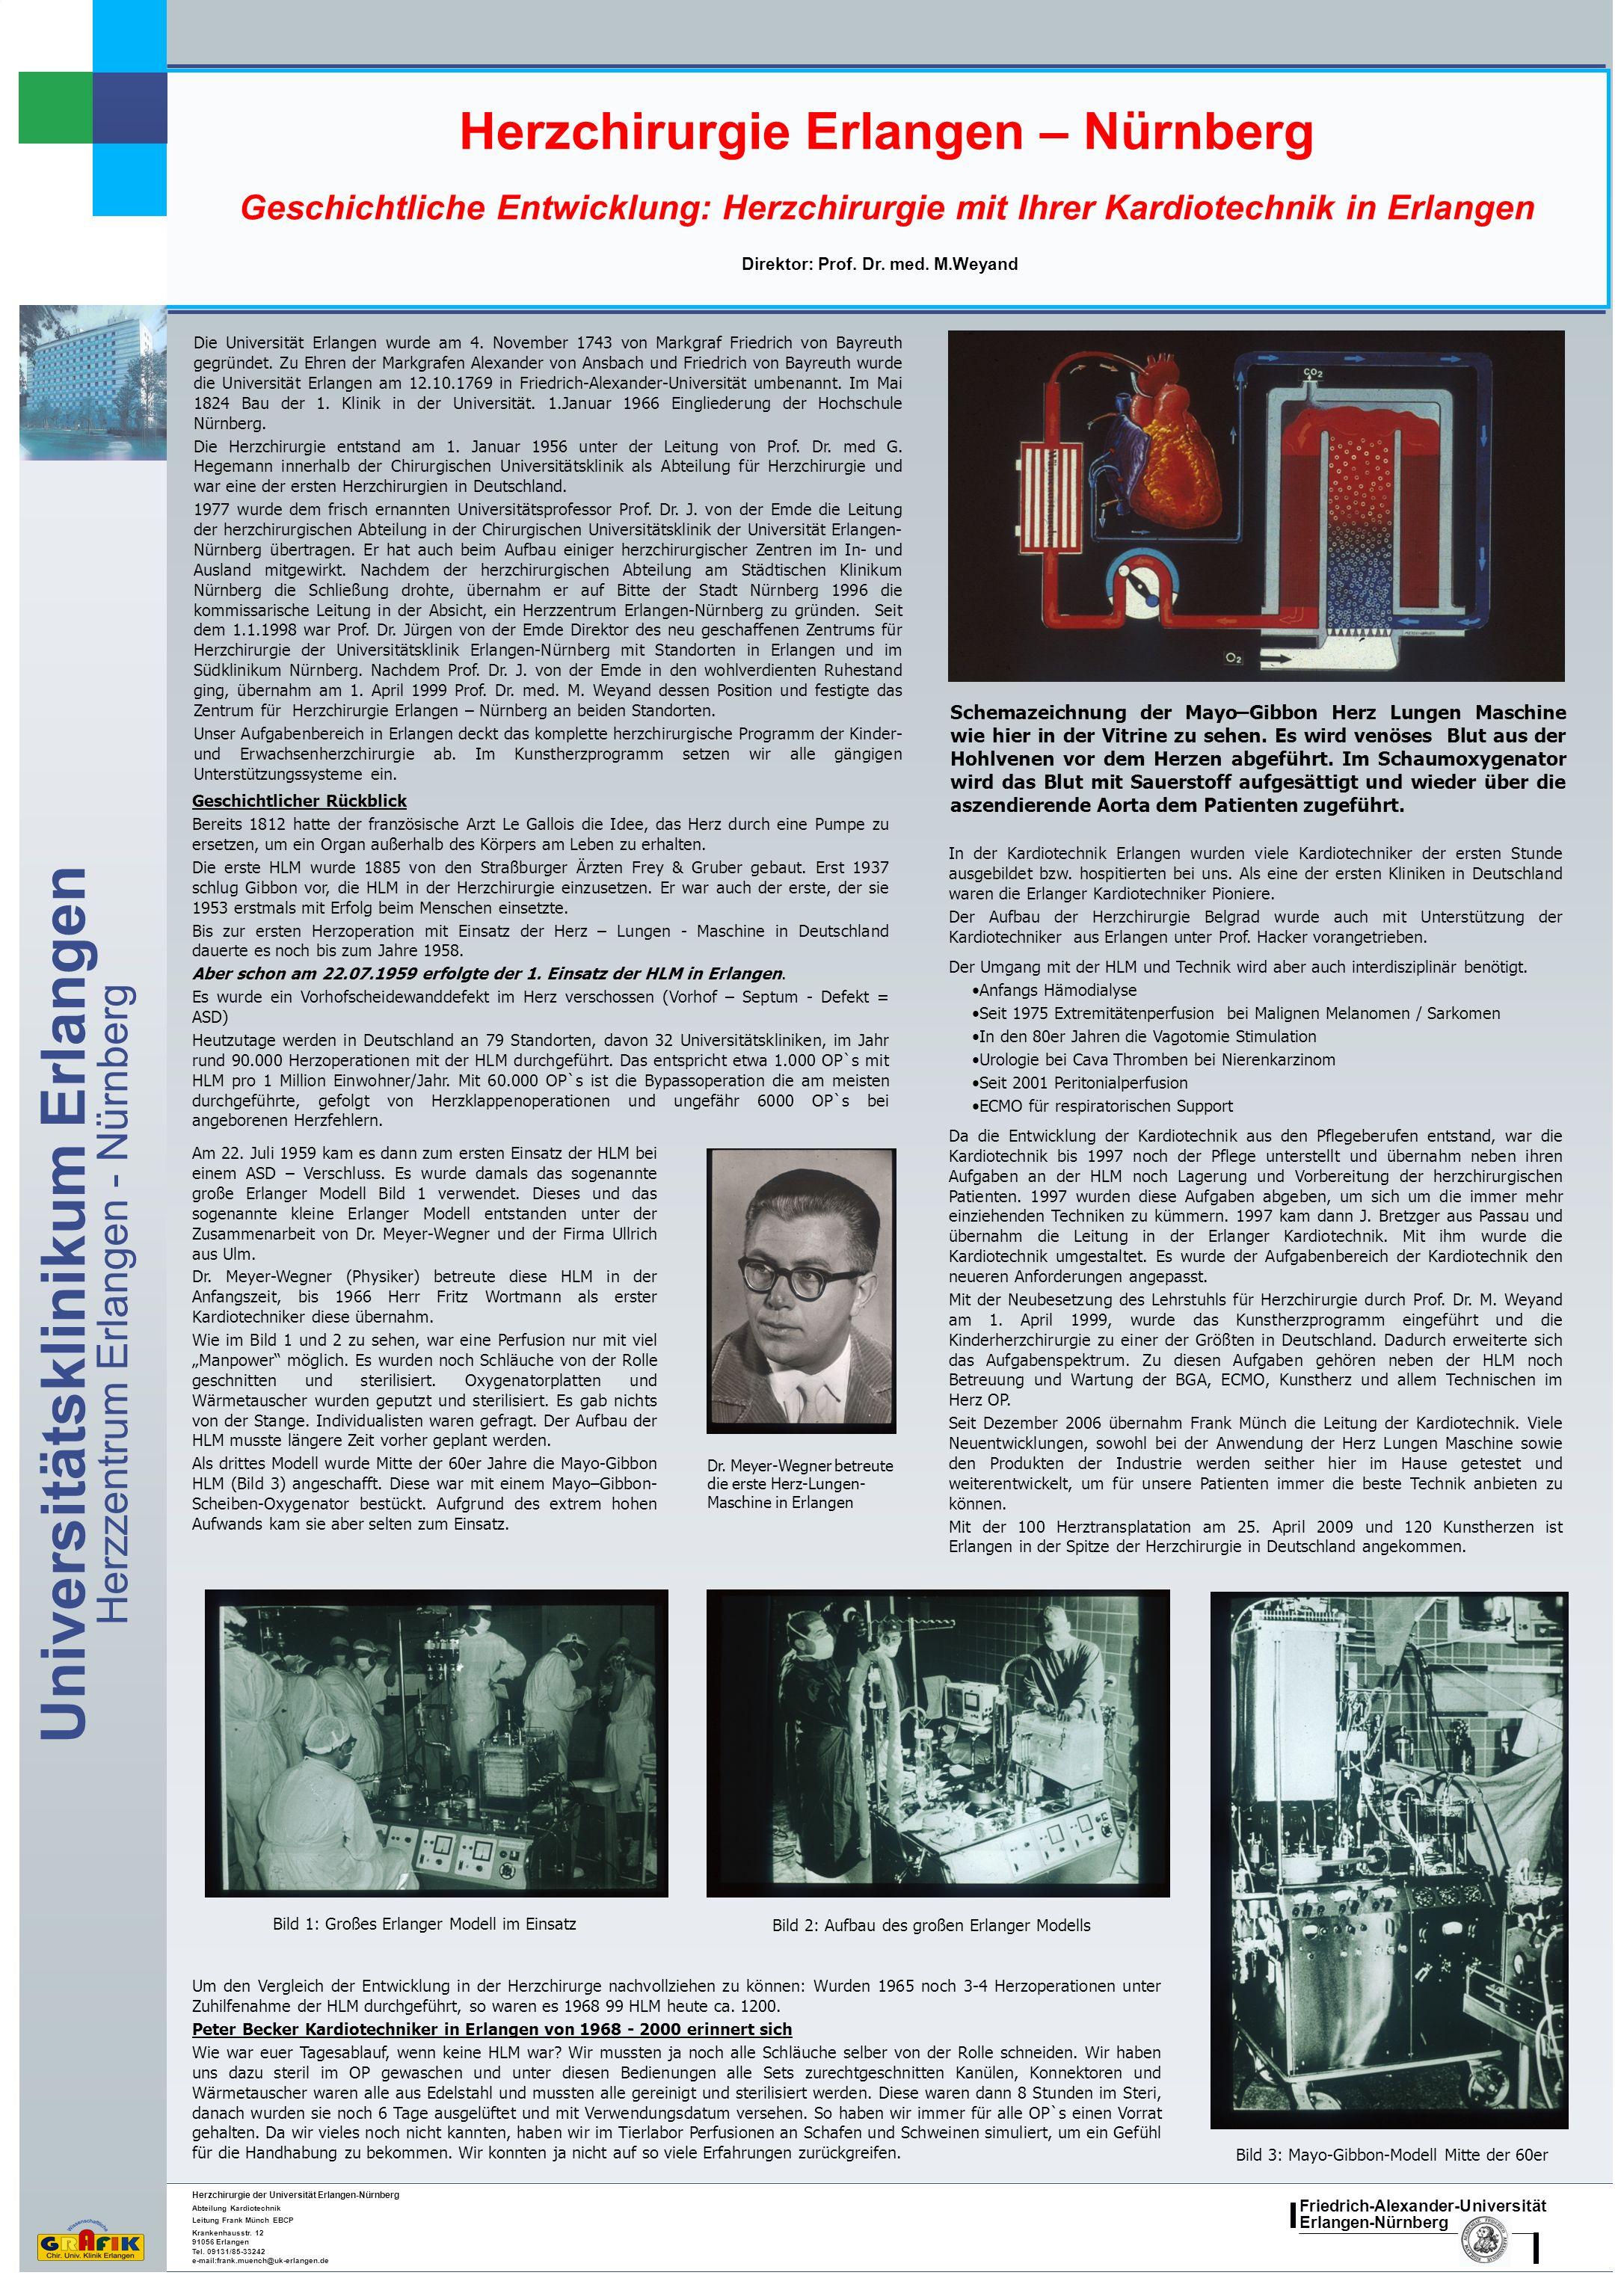 Friedrich-Alexander-Universität Erlangen-Nürnberg Universitätsklinikum Erlangen Herzzentrum Erlangen - Nürnberg Herzchirurgie Erlangen – Nürnberg Gesc